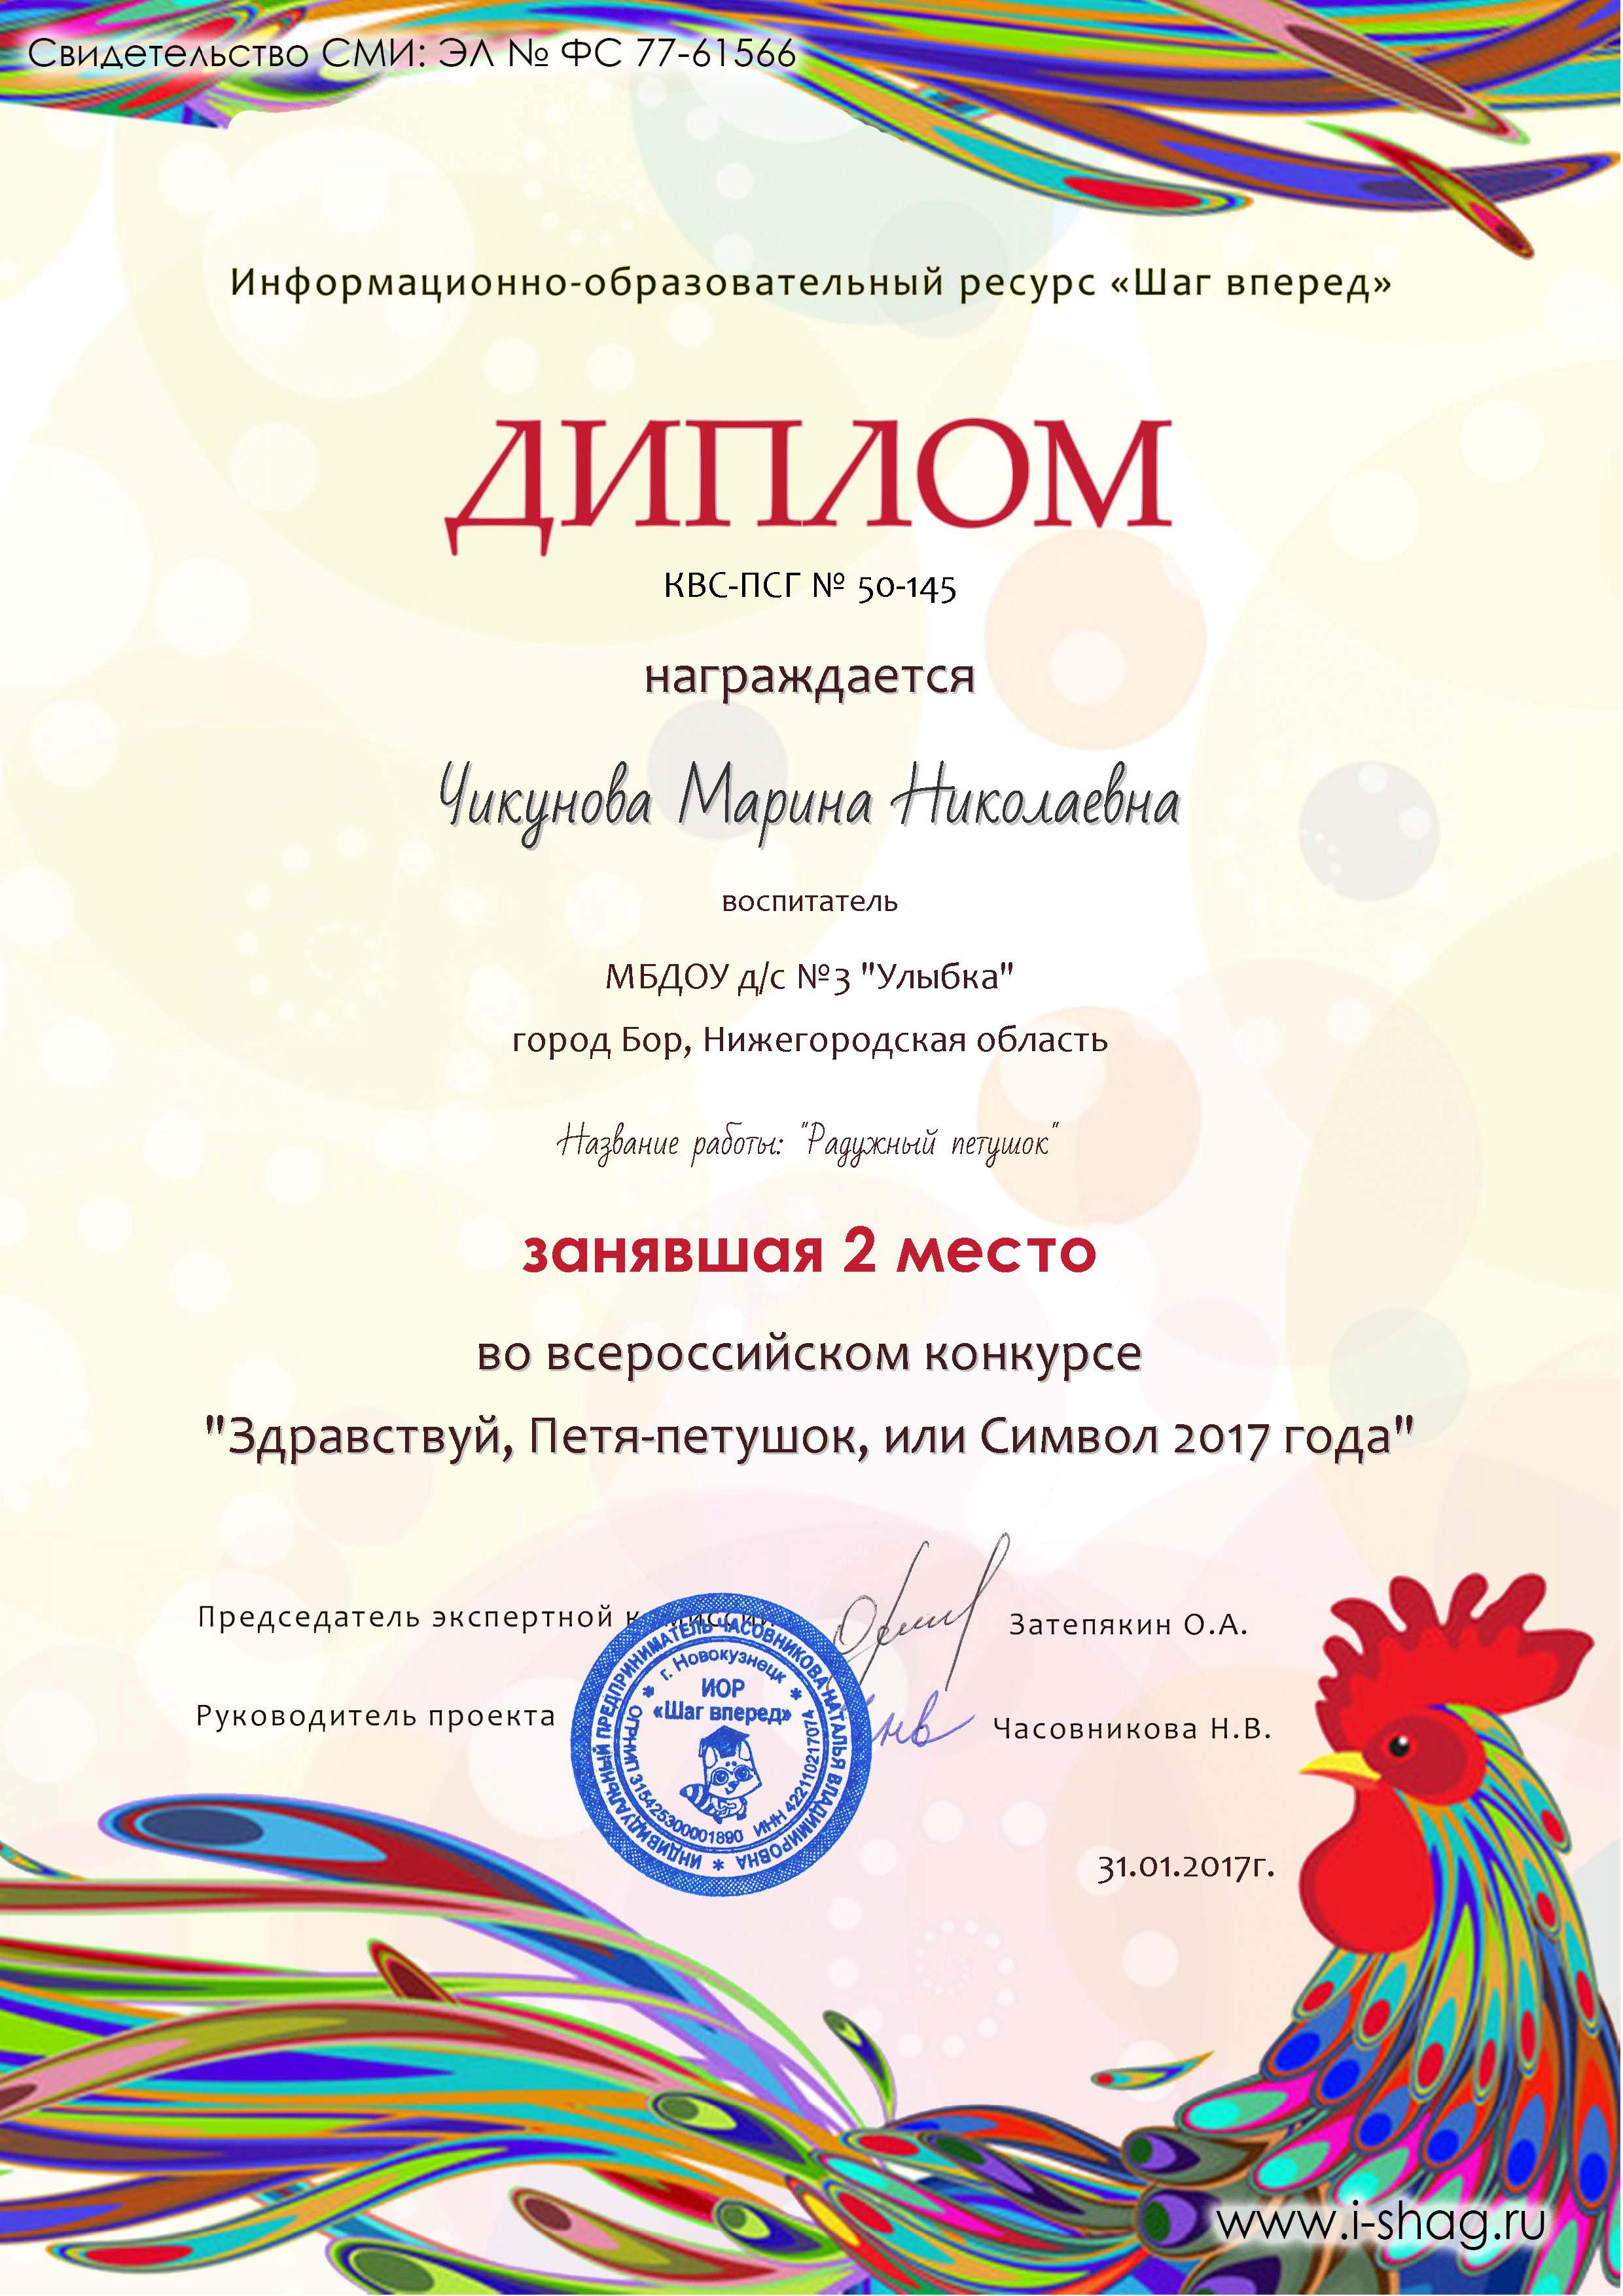 КВС-ПСГ-№-50-145-Чикунова-Марина-Николаевна.jpg